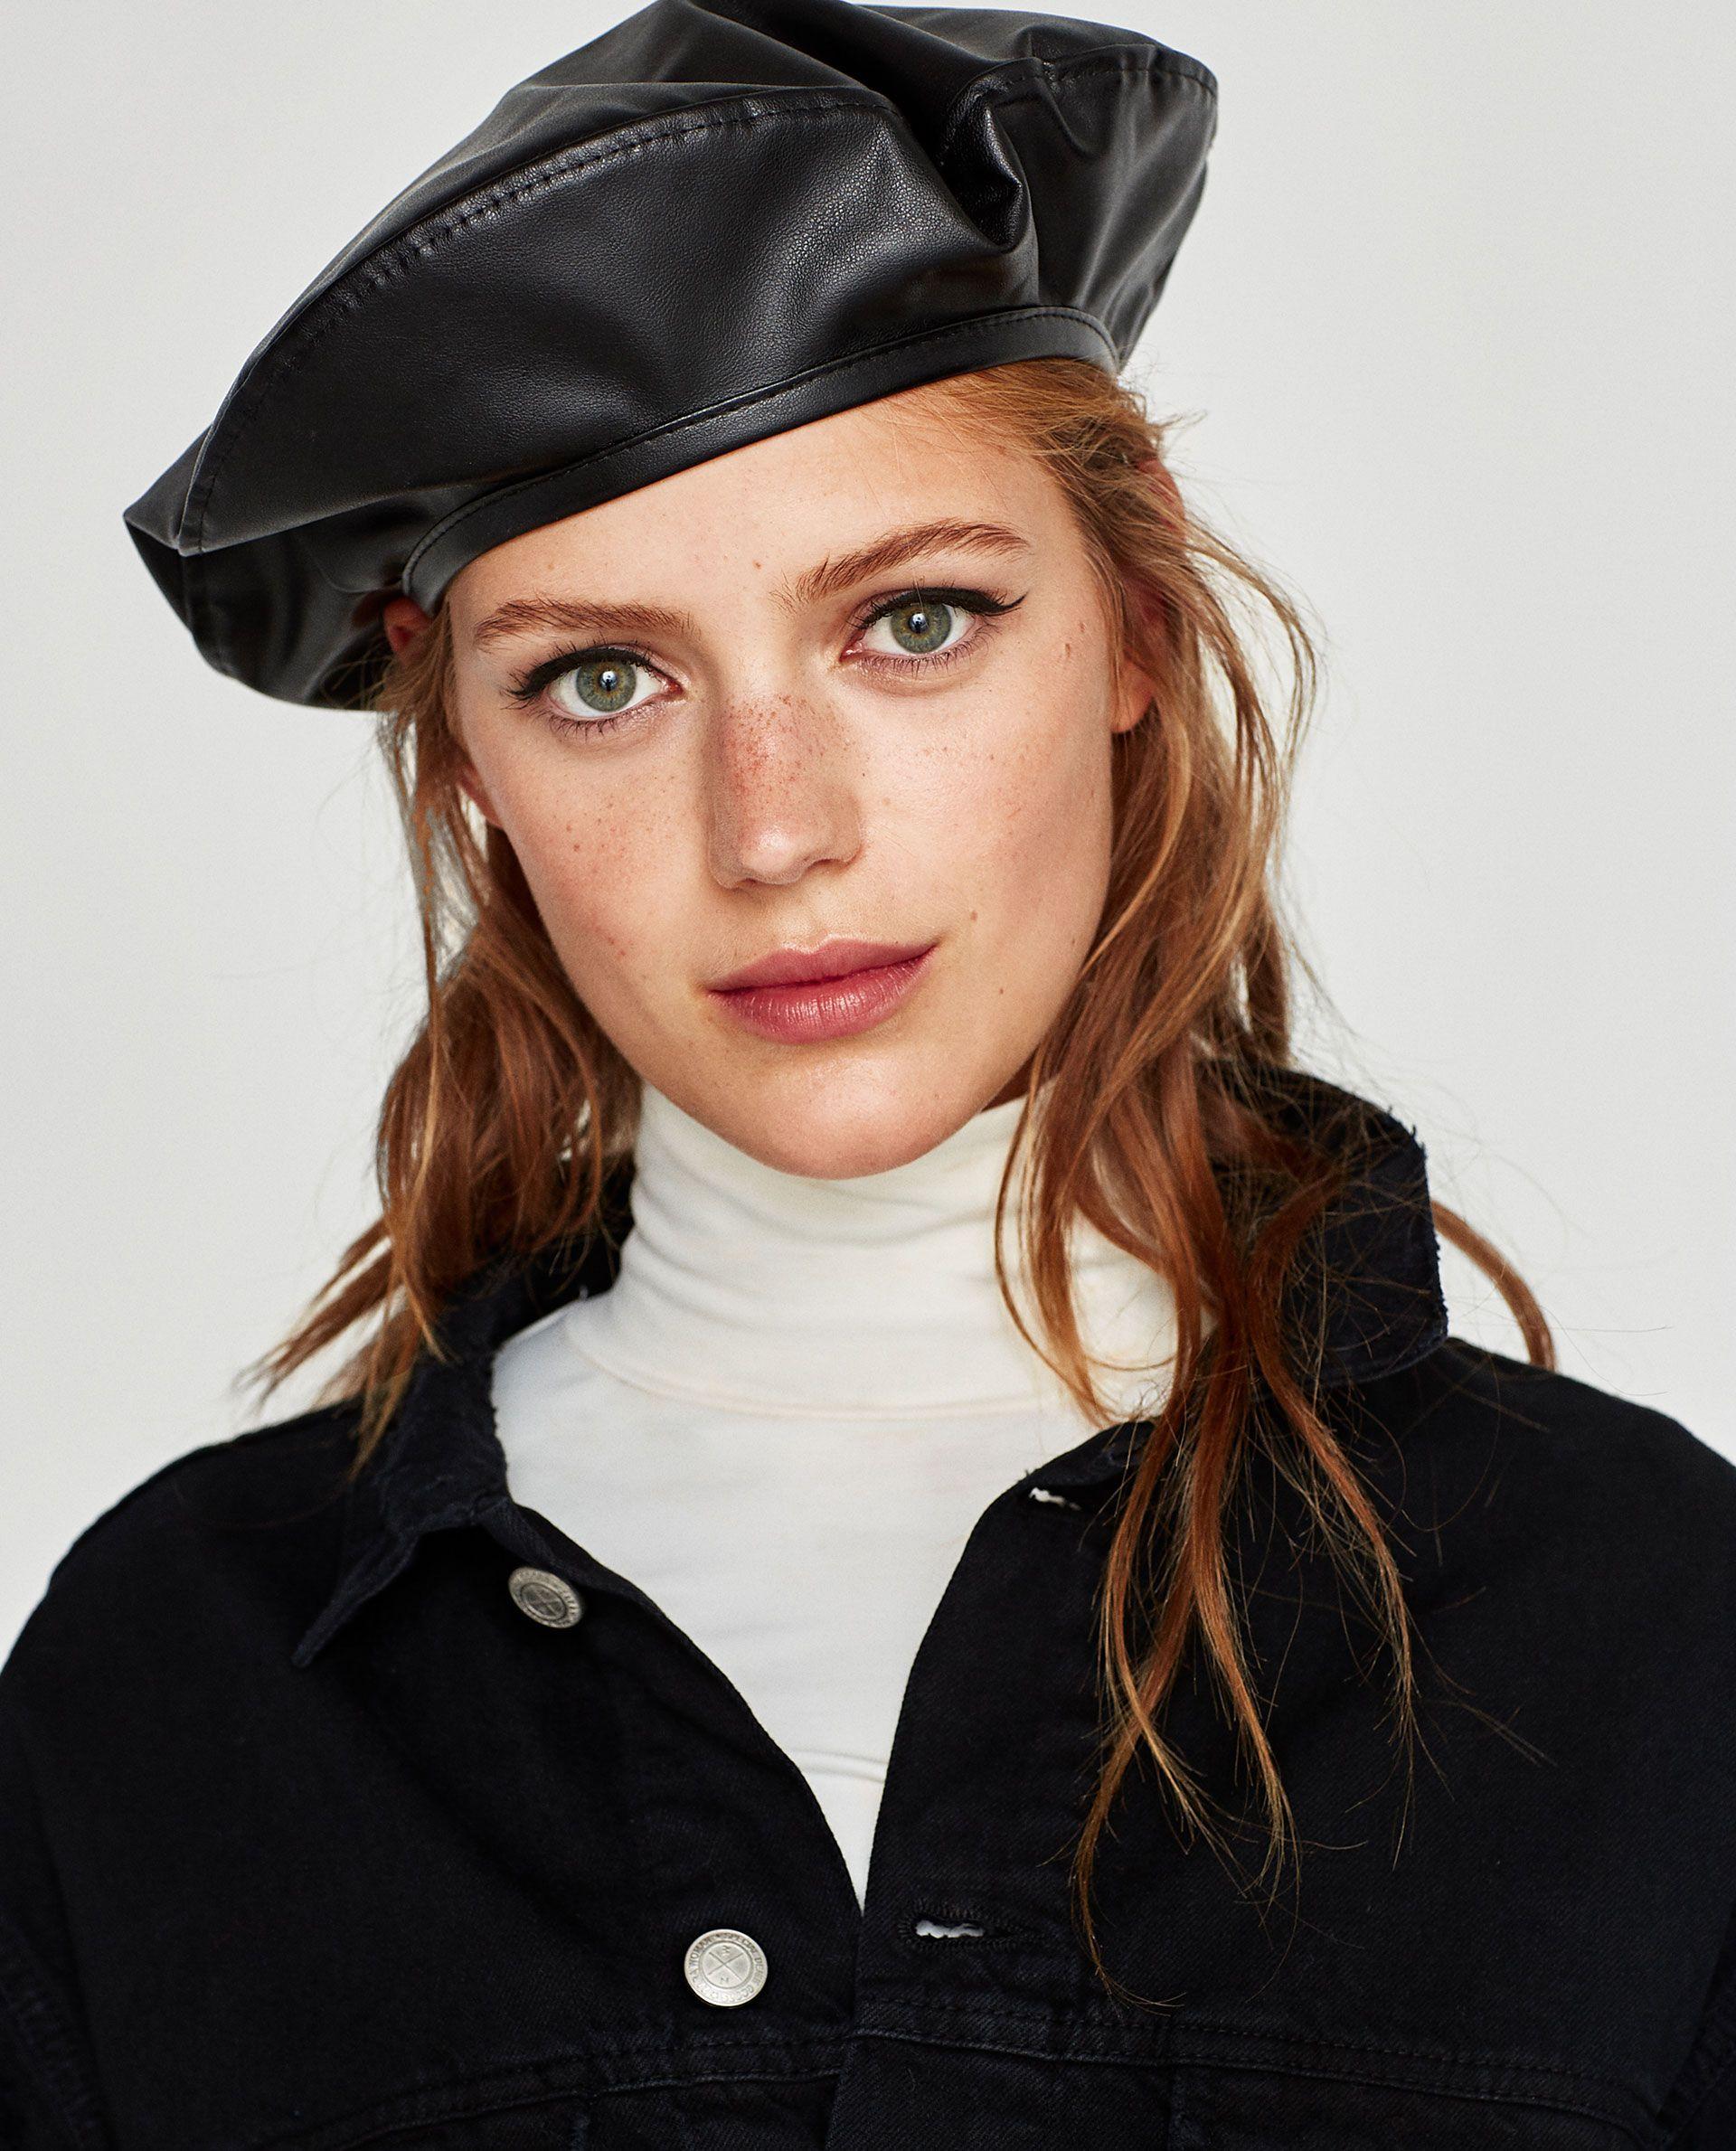 éclatant sélectionner pour dernier prix plancher Pin by cate on others: character inspo | Beret, Leather hats ...